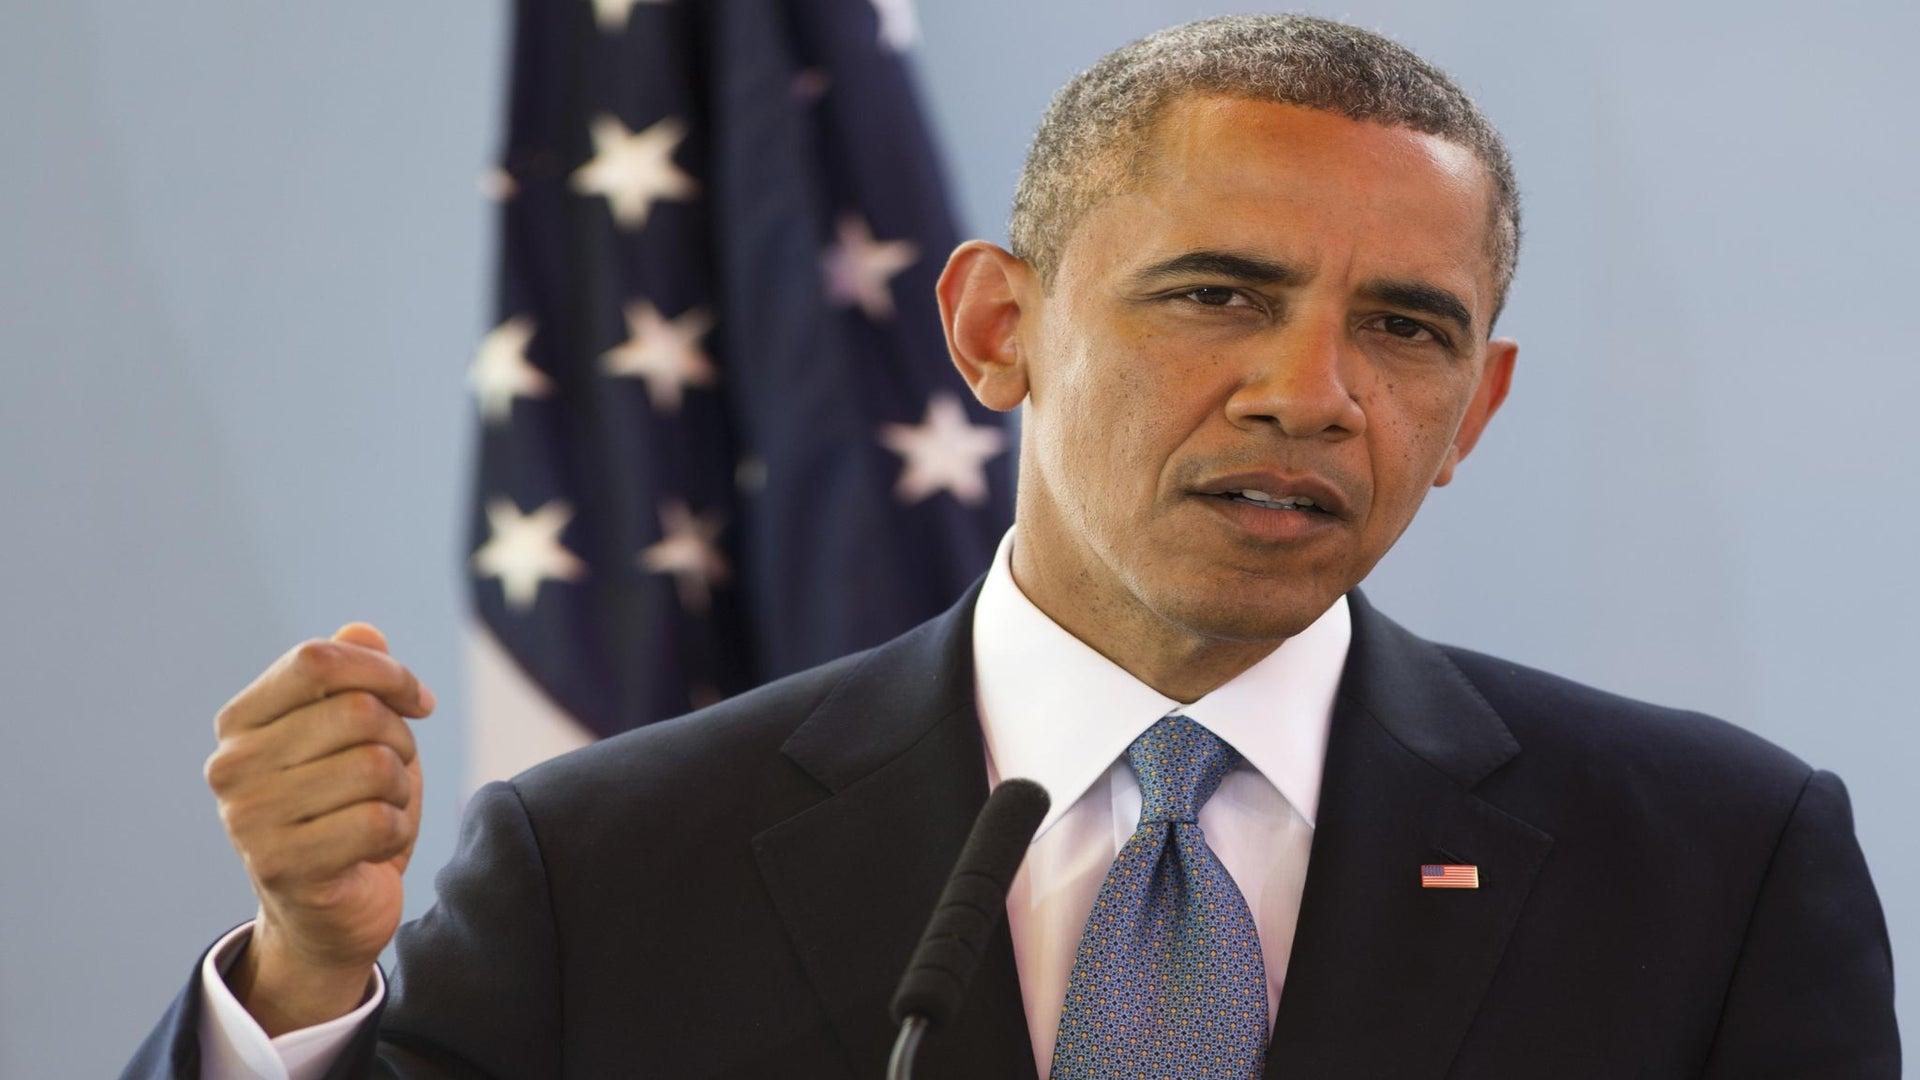 President Obama Addresses Navy Yard Shootings